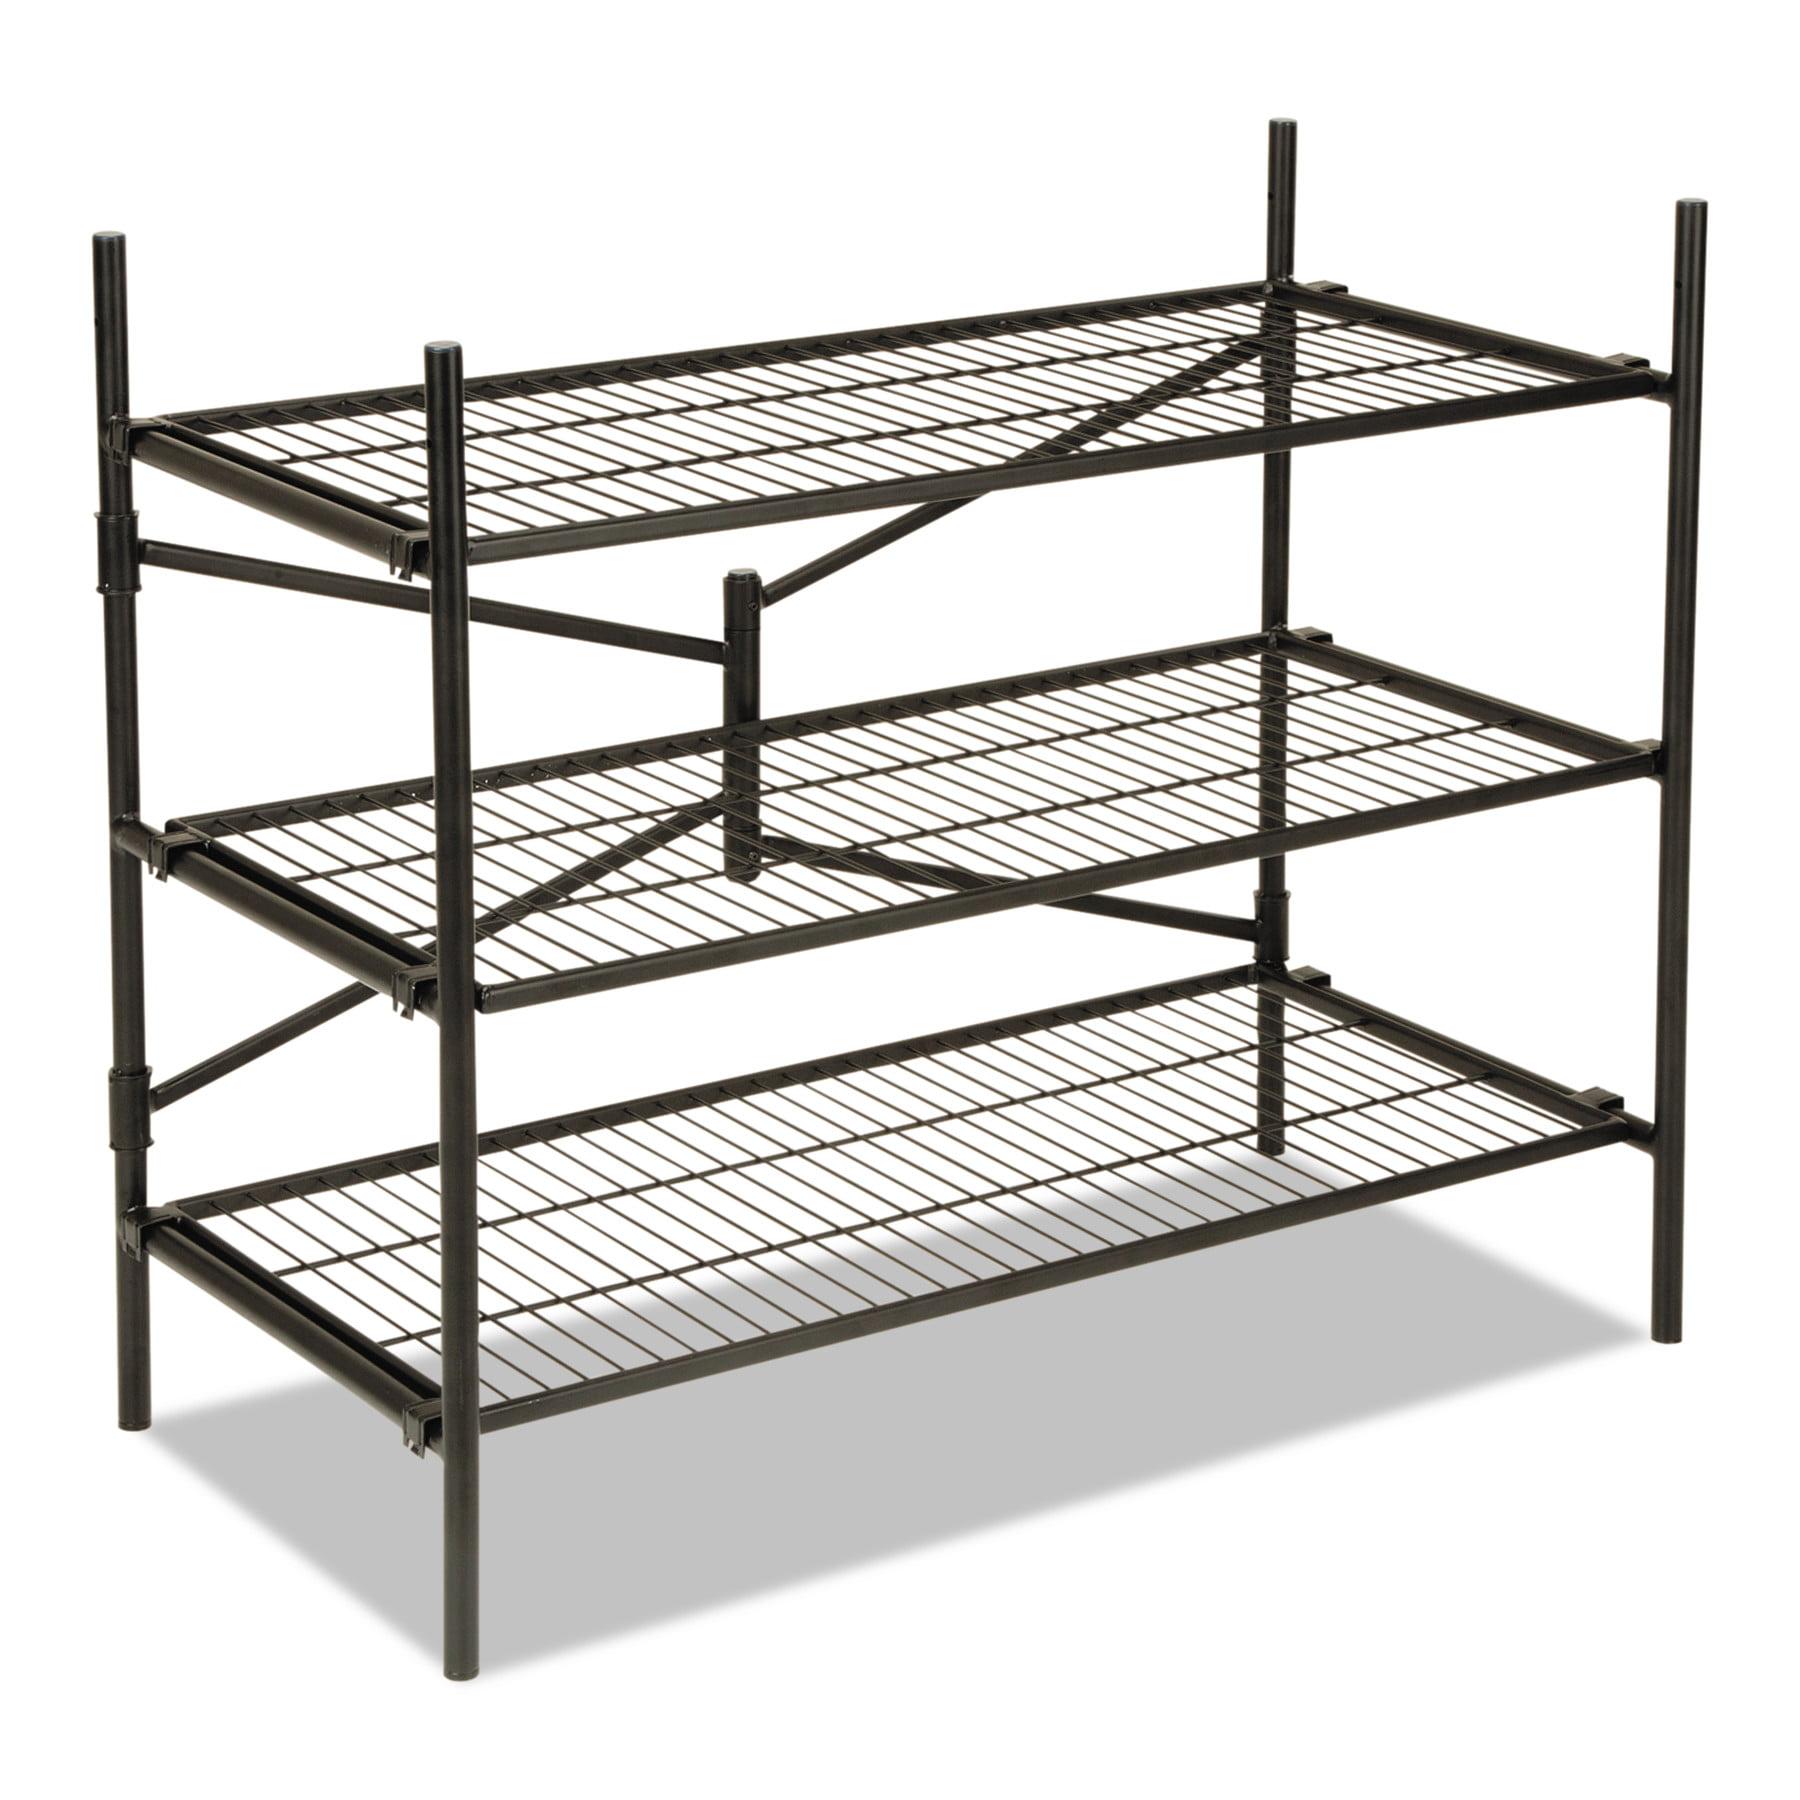 Cosco Instant Storage Shelving Unit, 3 Shelves, Black